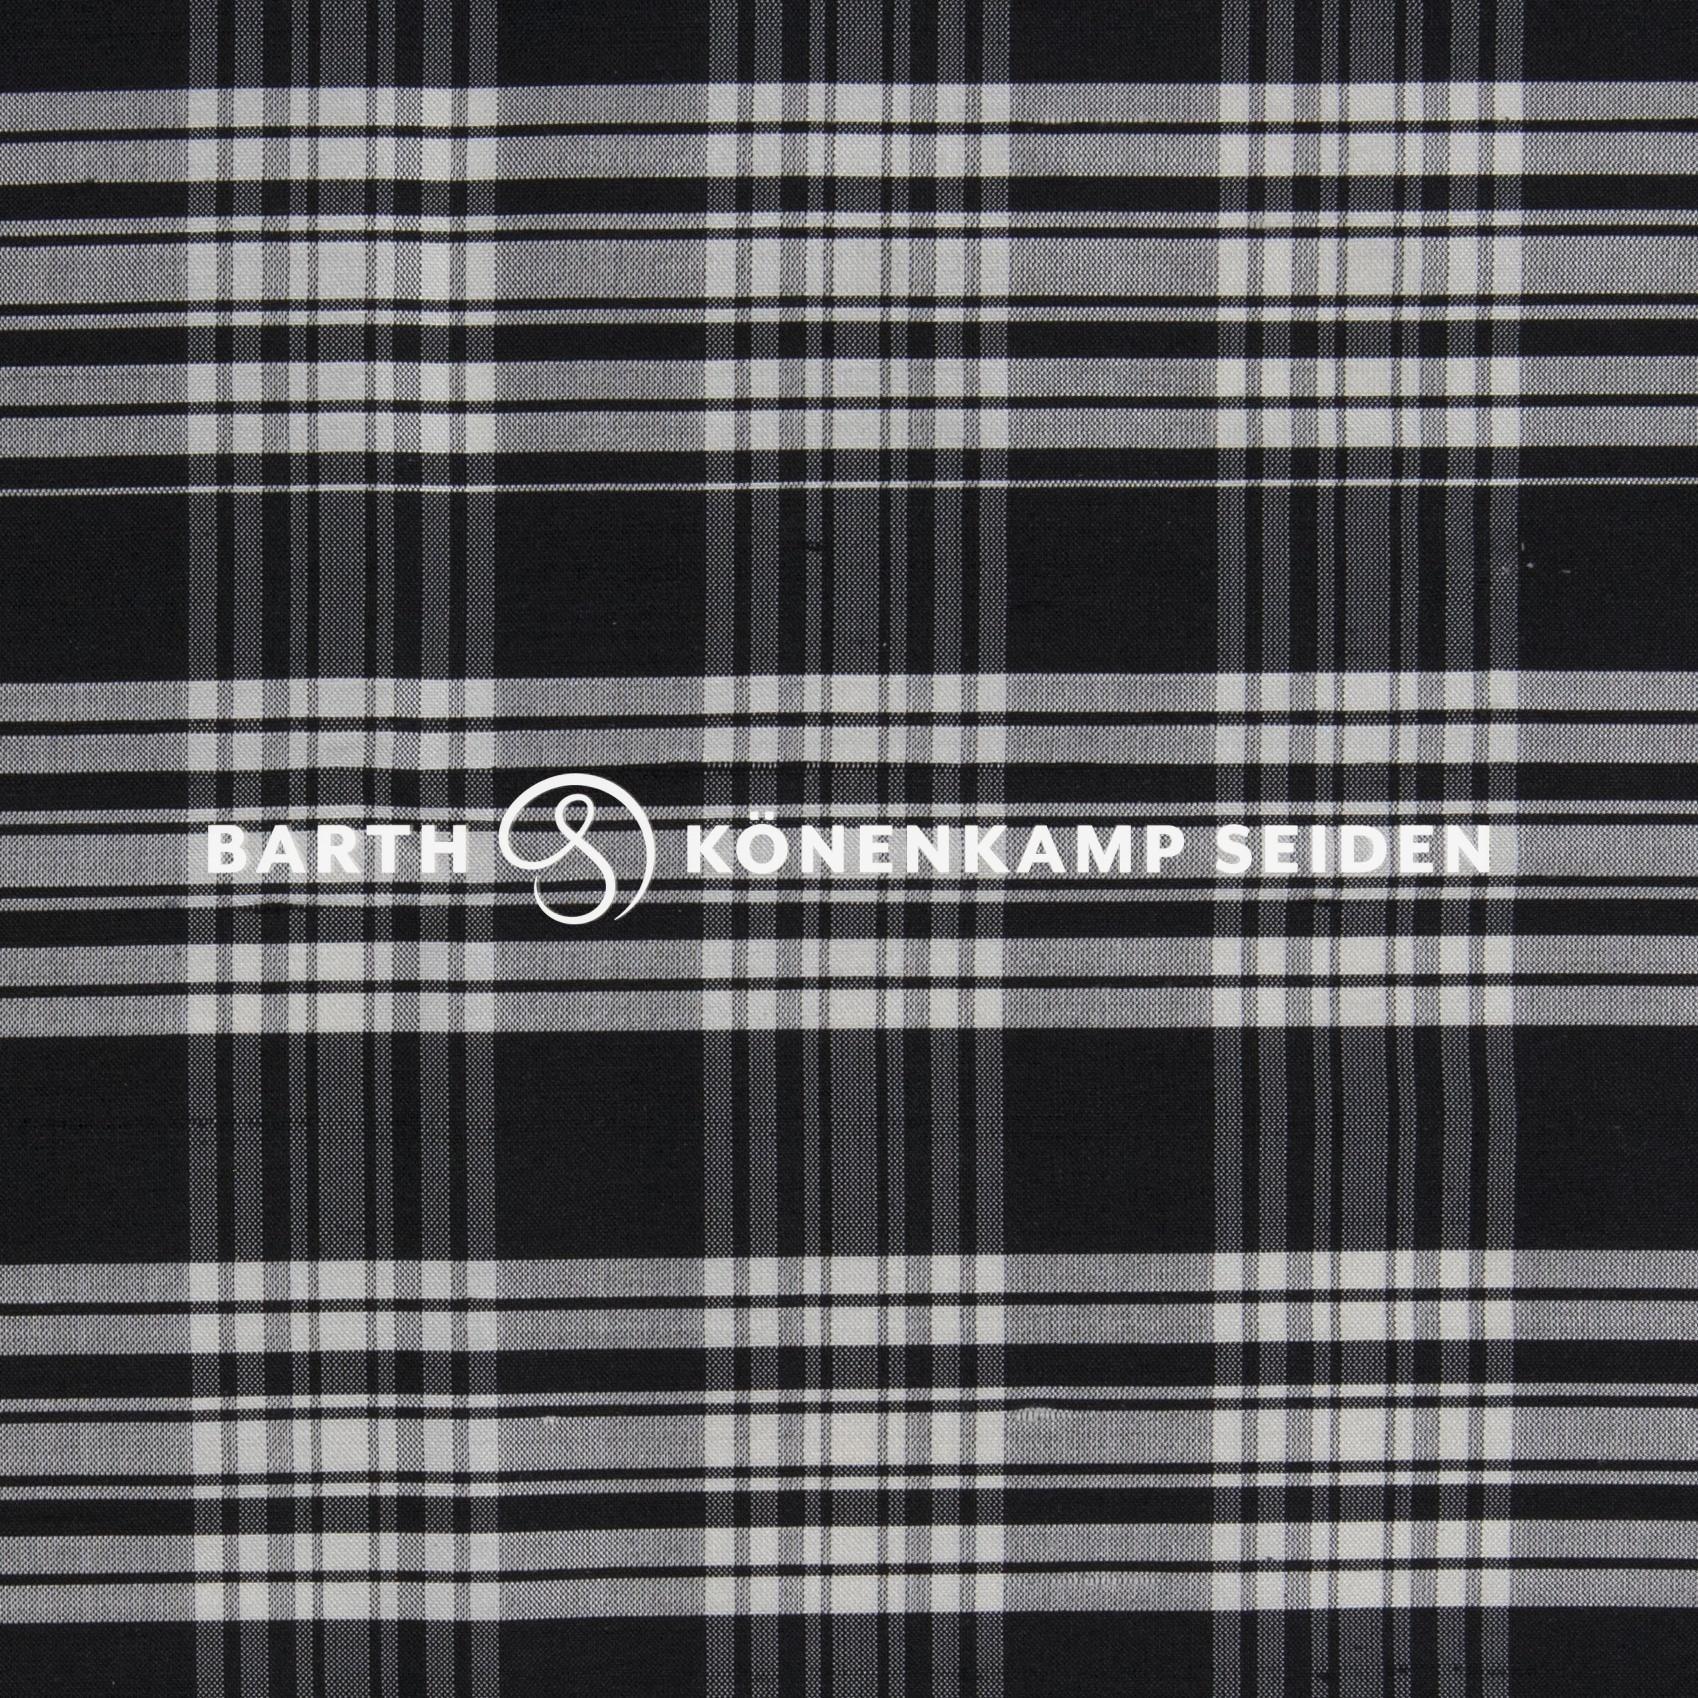 3090B-113 / Doupion silk checked